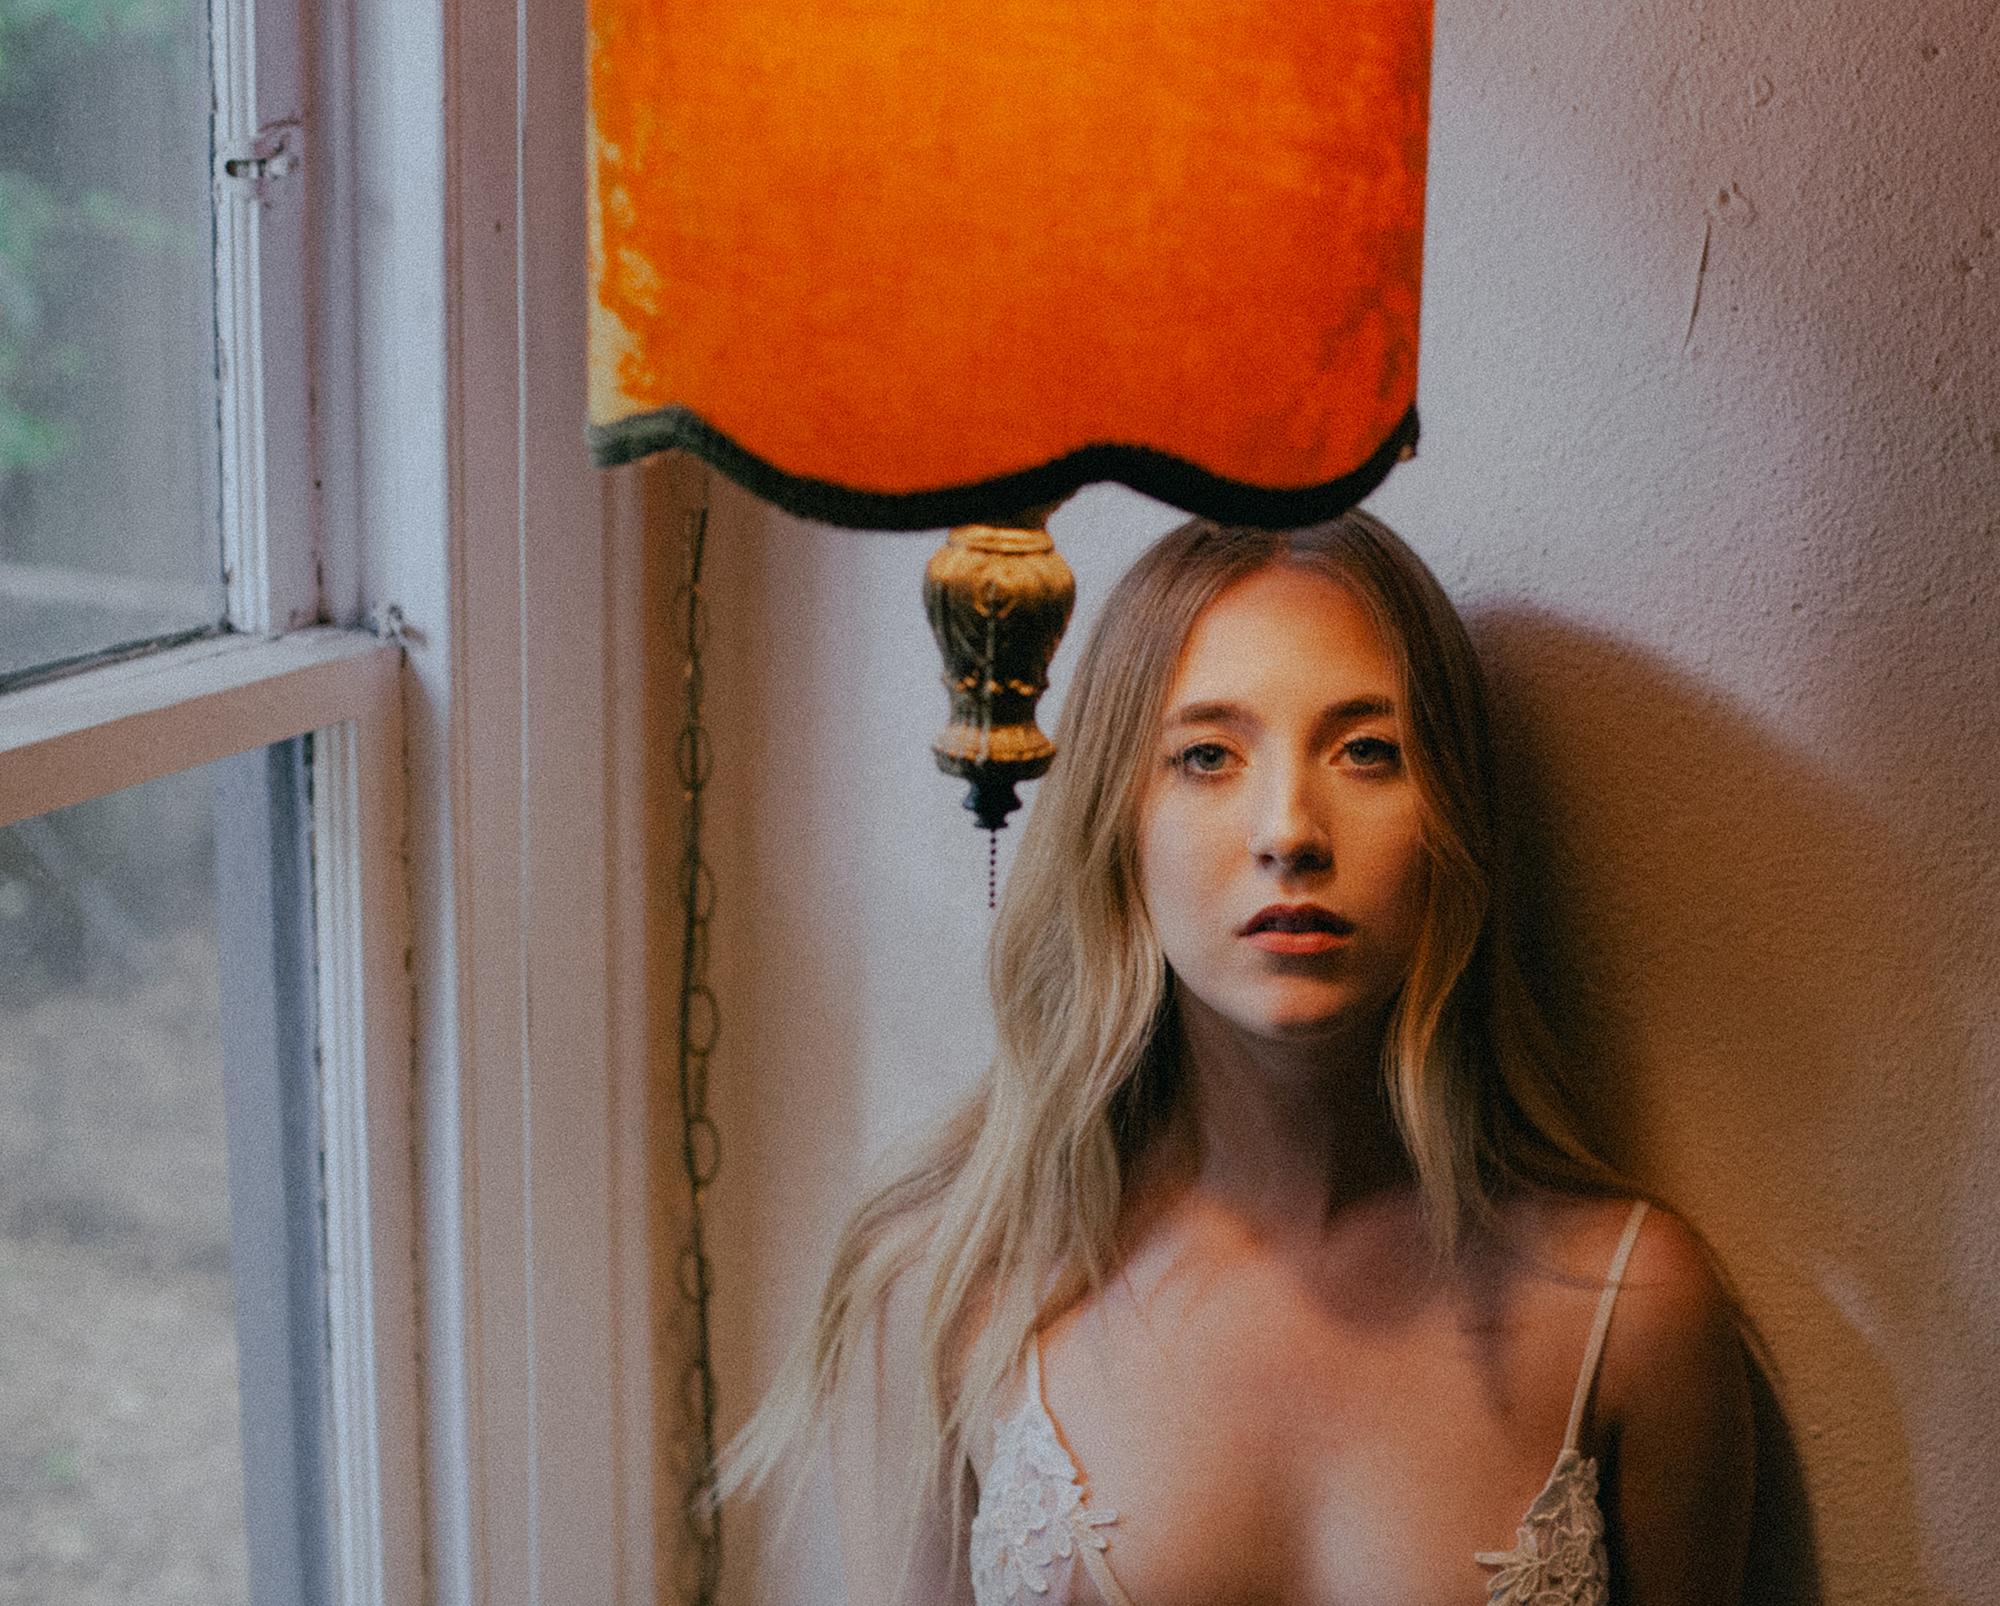 woman in bra under vintage orange lamp